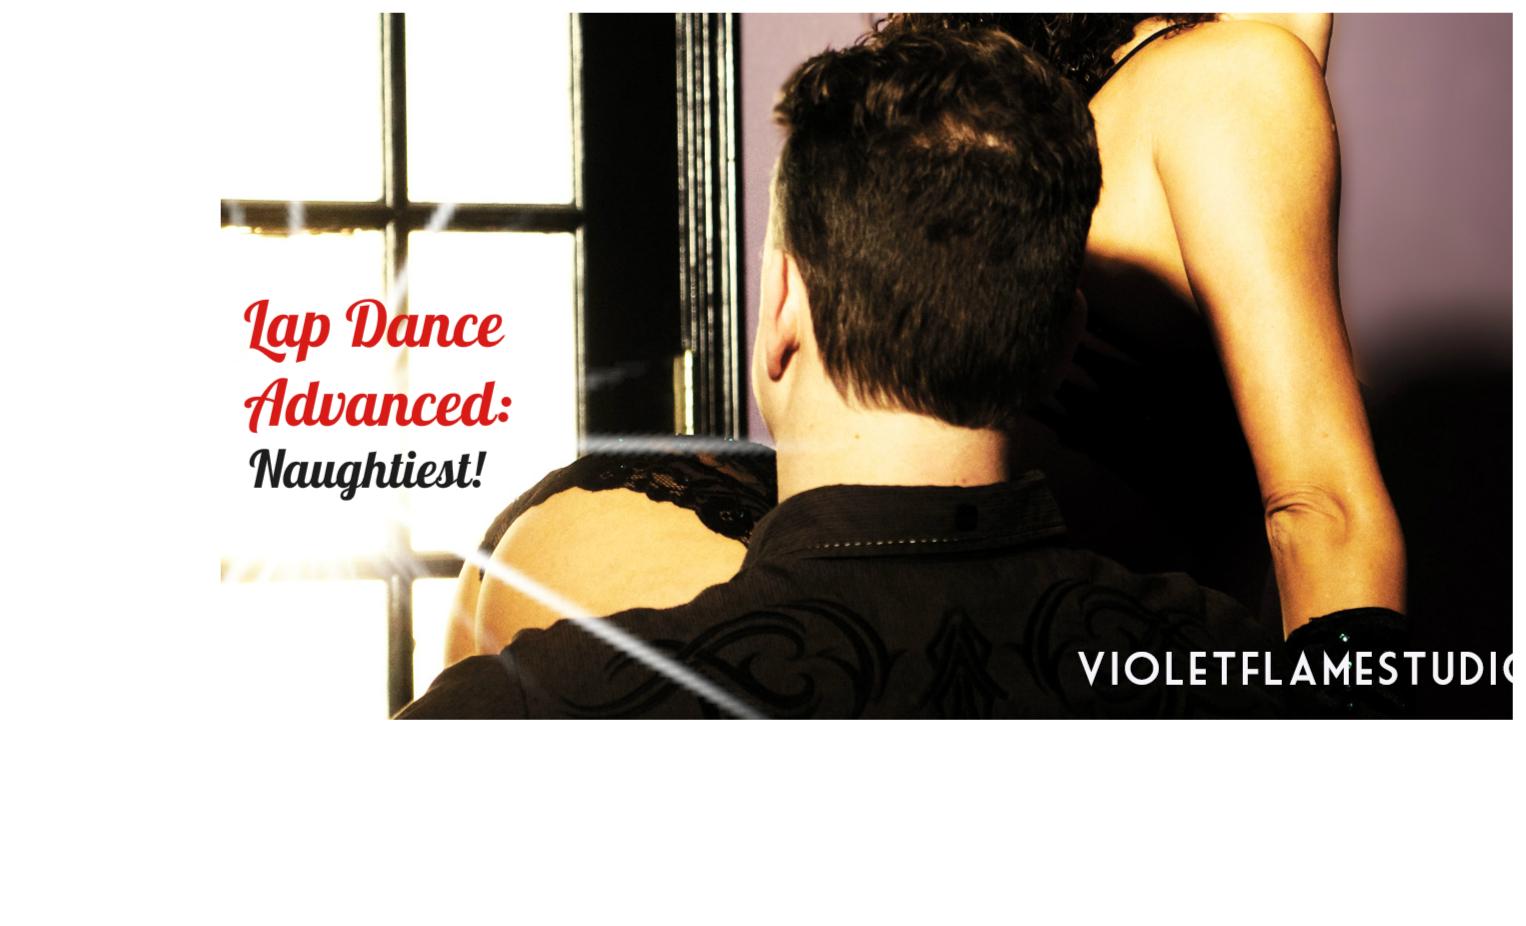 Lap Dance Advanced - Wednesday October 9th7:30-9:00pmREGISTER HERE!